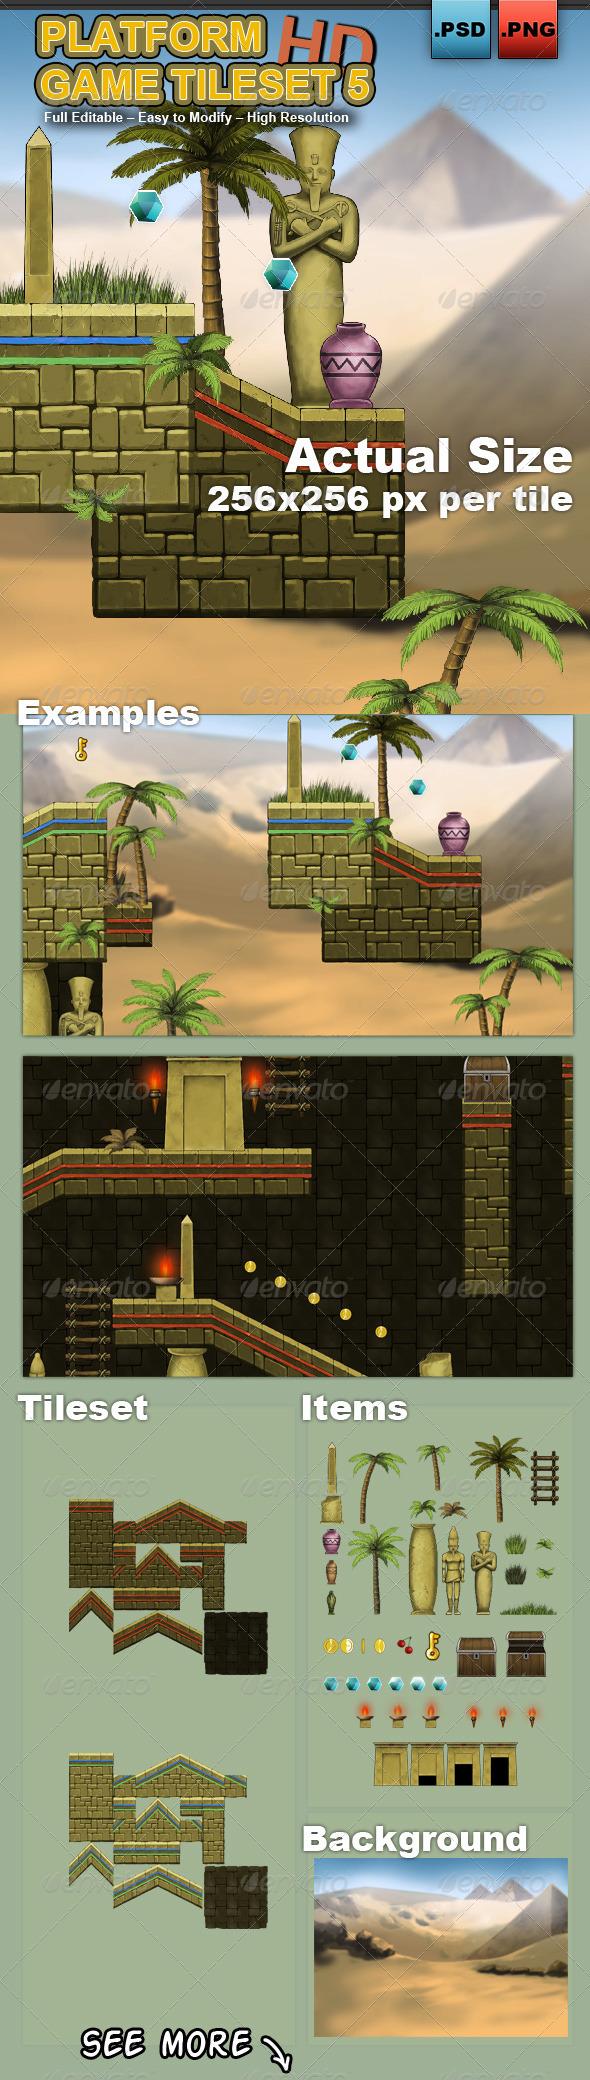 Platform Game Tileset 5: Egyptian Temple - Tilesets Game Assets